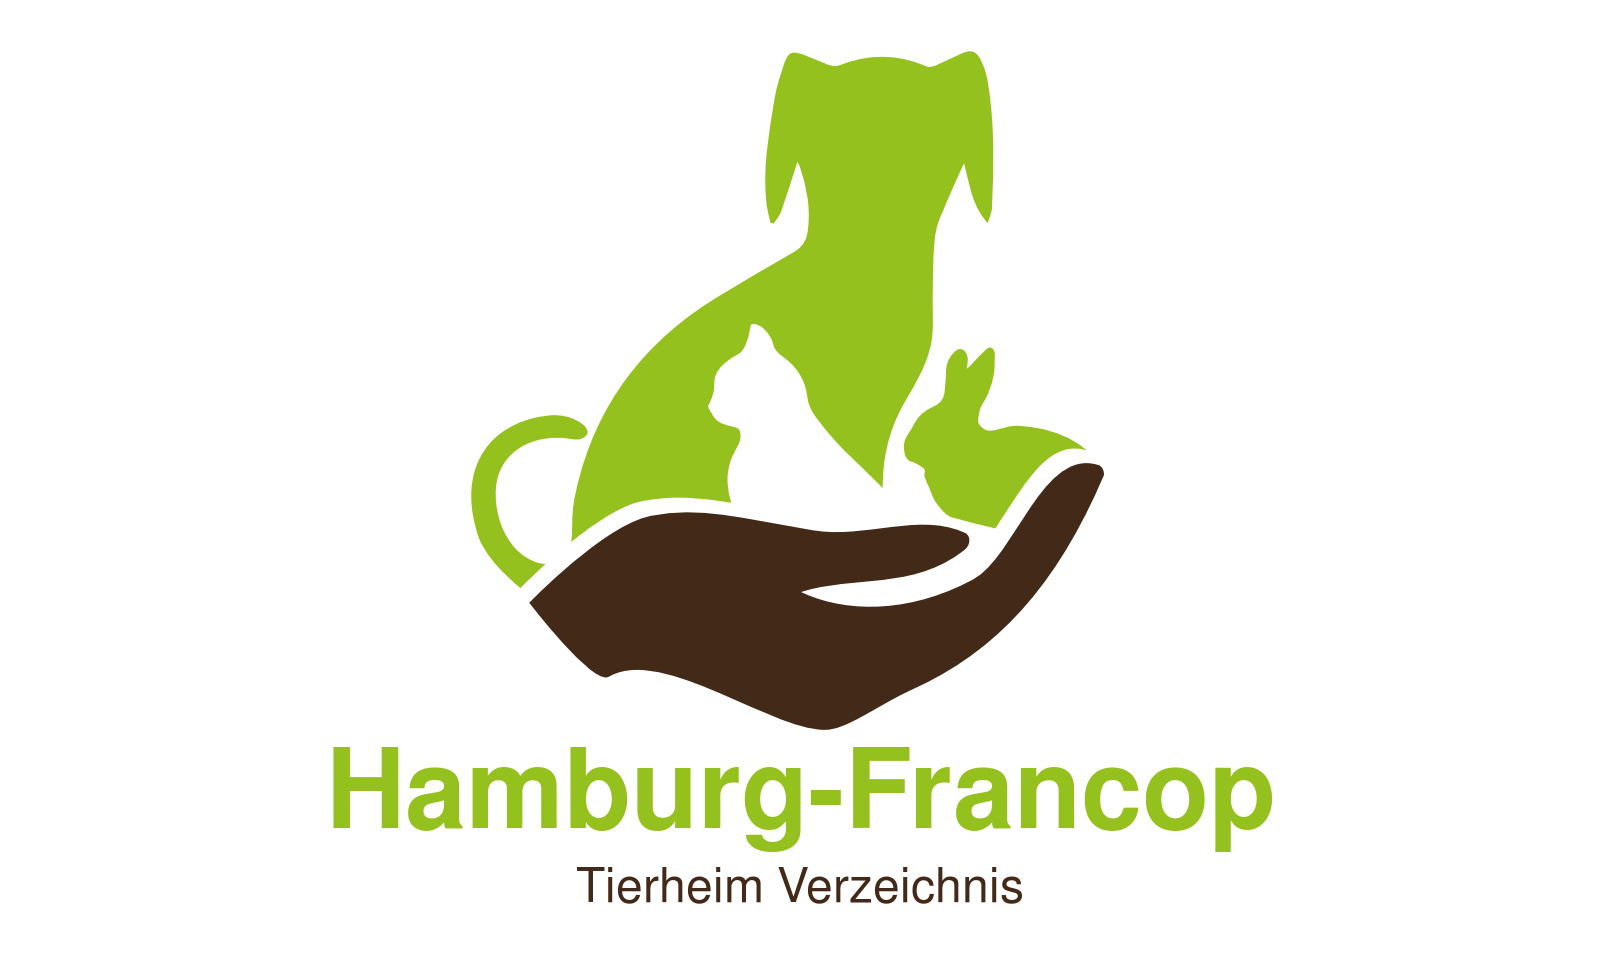 Tierheim Hamburg Francop